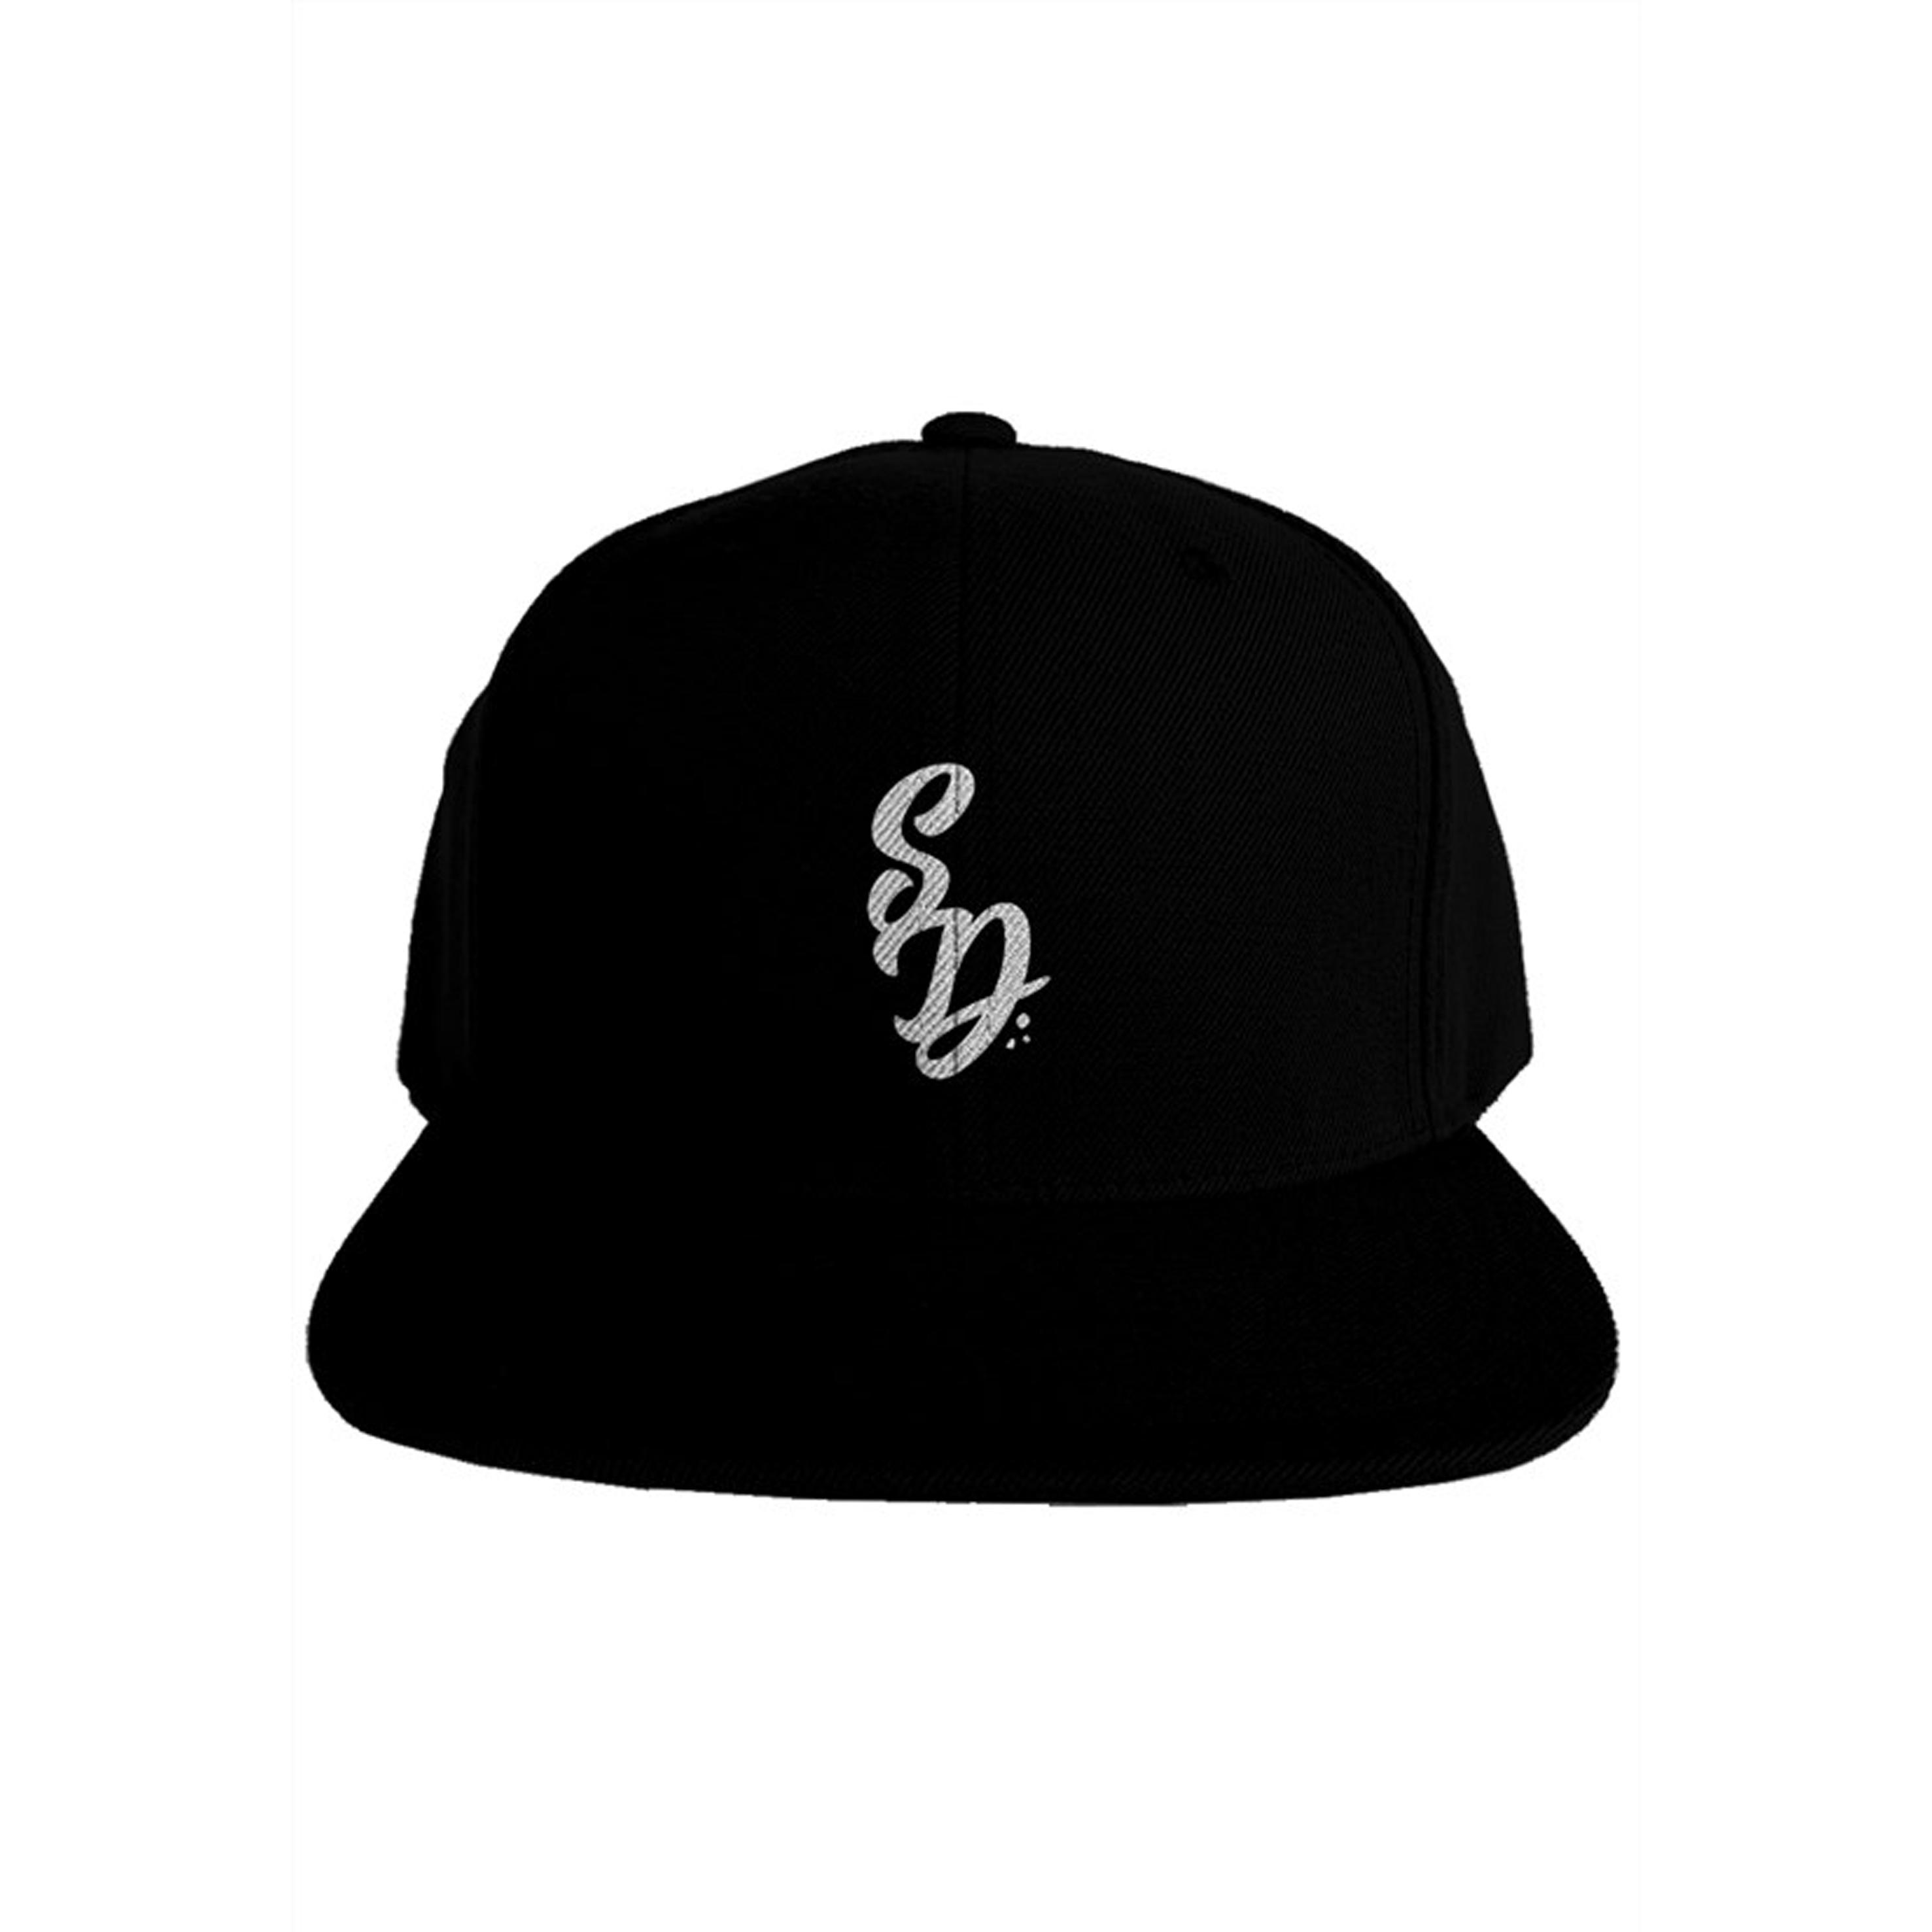 SD team embroidered snapback